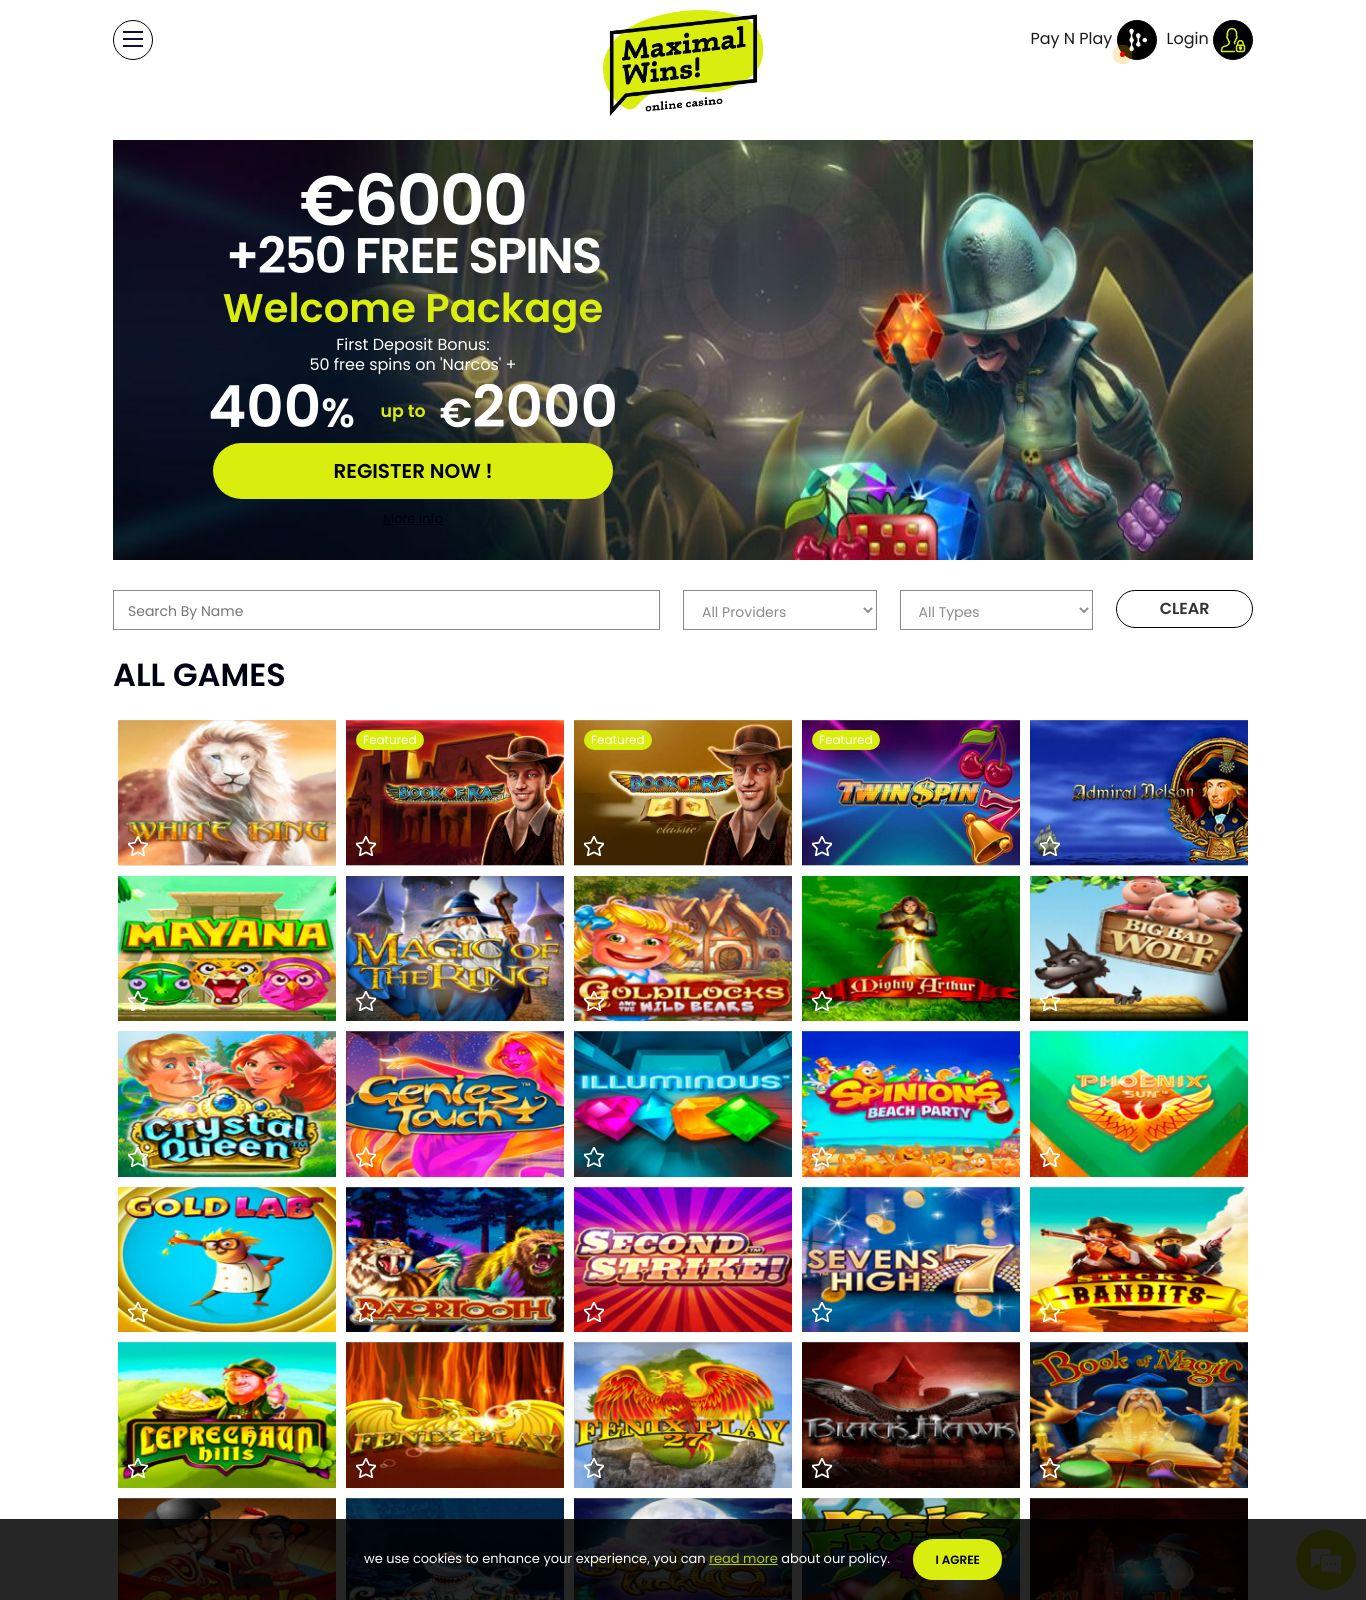 Maximal Wins Online Casino Review 2021 Áˆ Maximal Wins Slot Games Maximalwins Com Mobile App